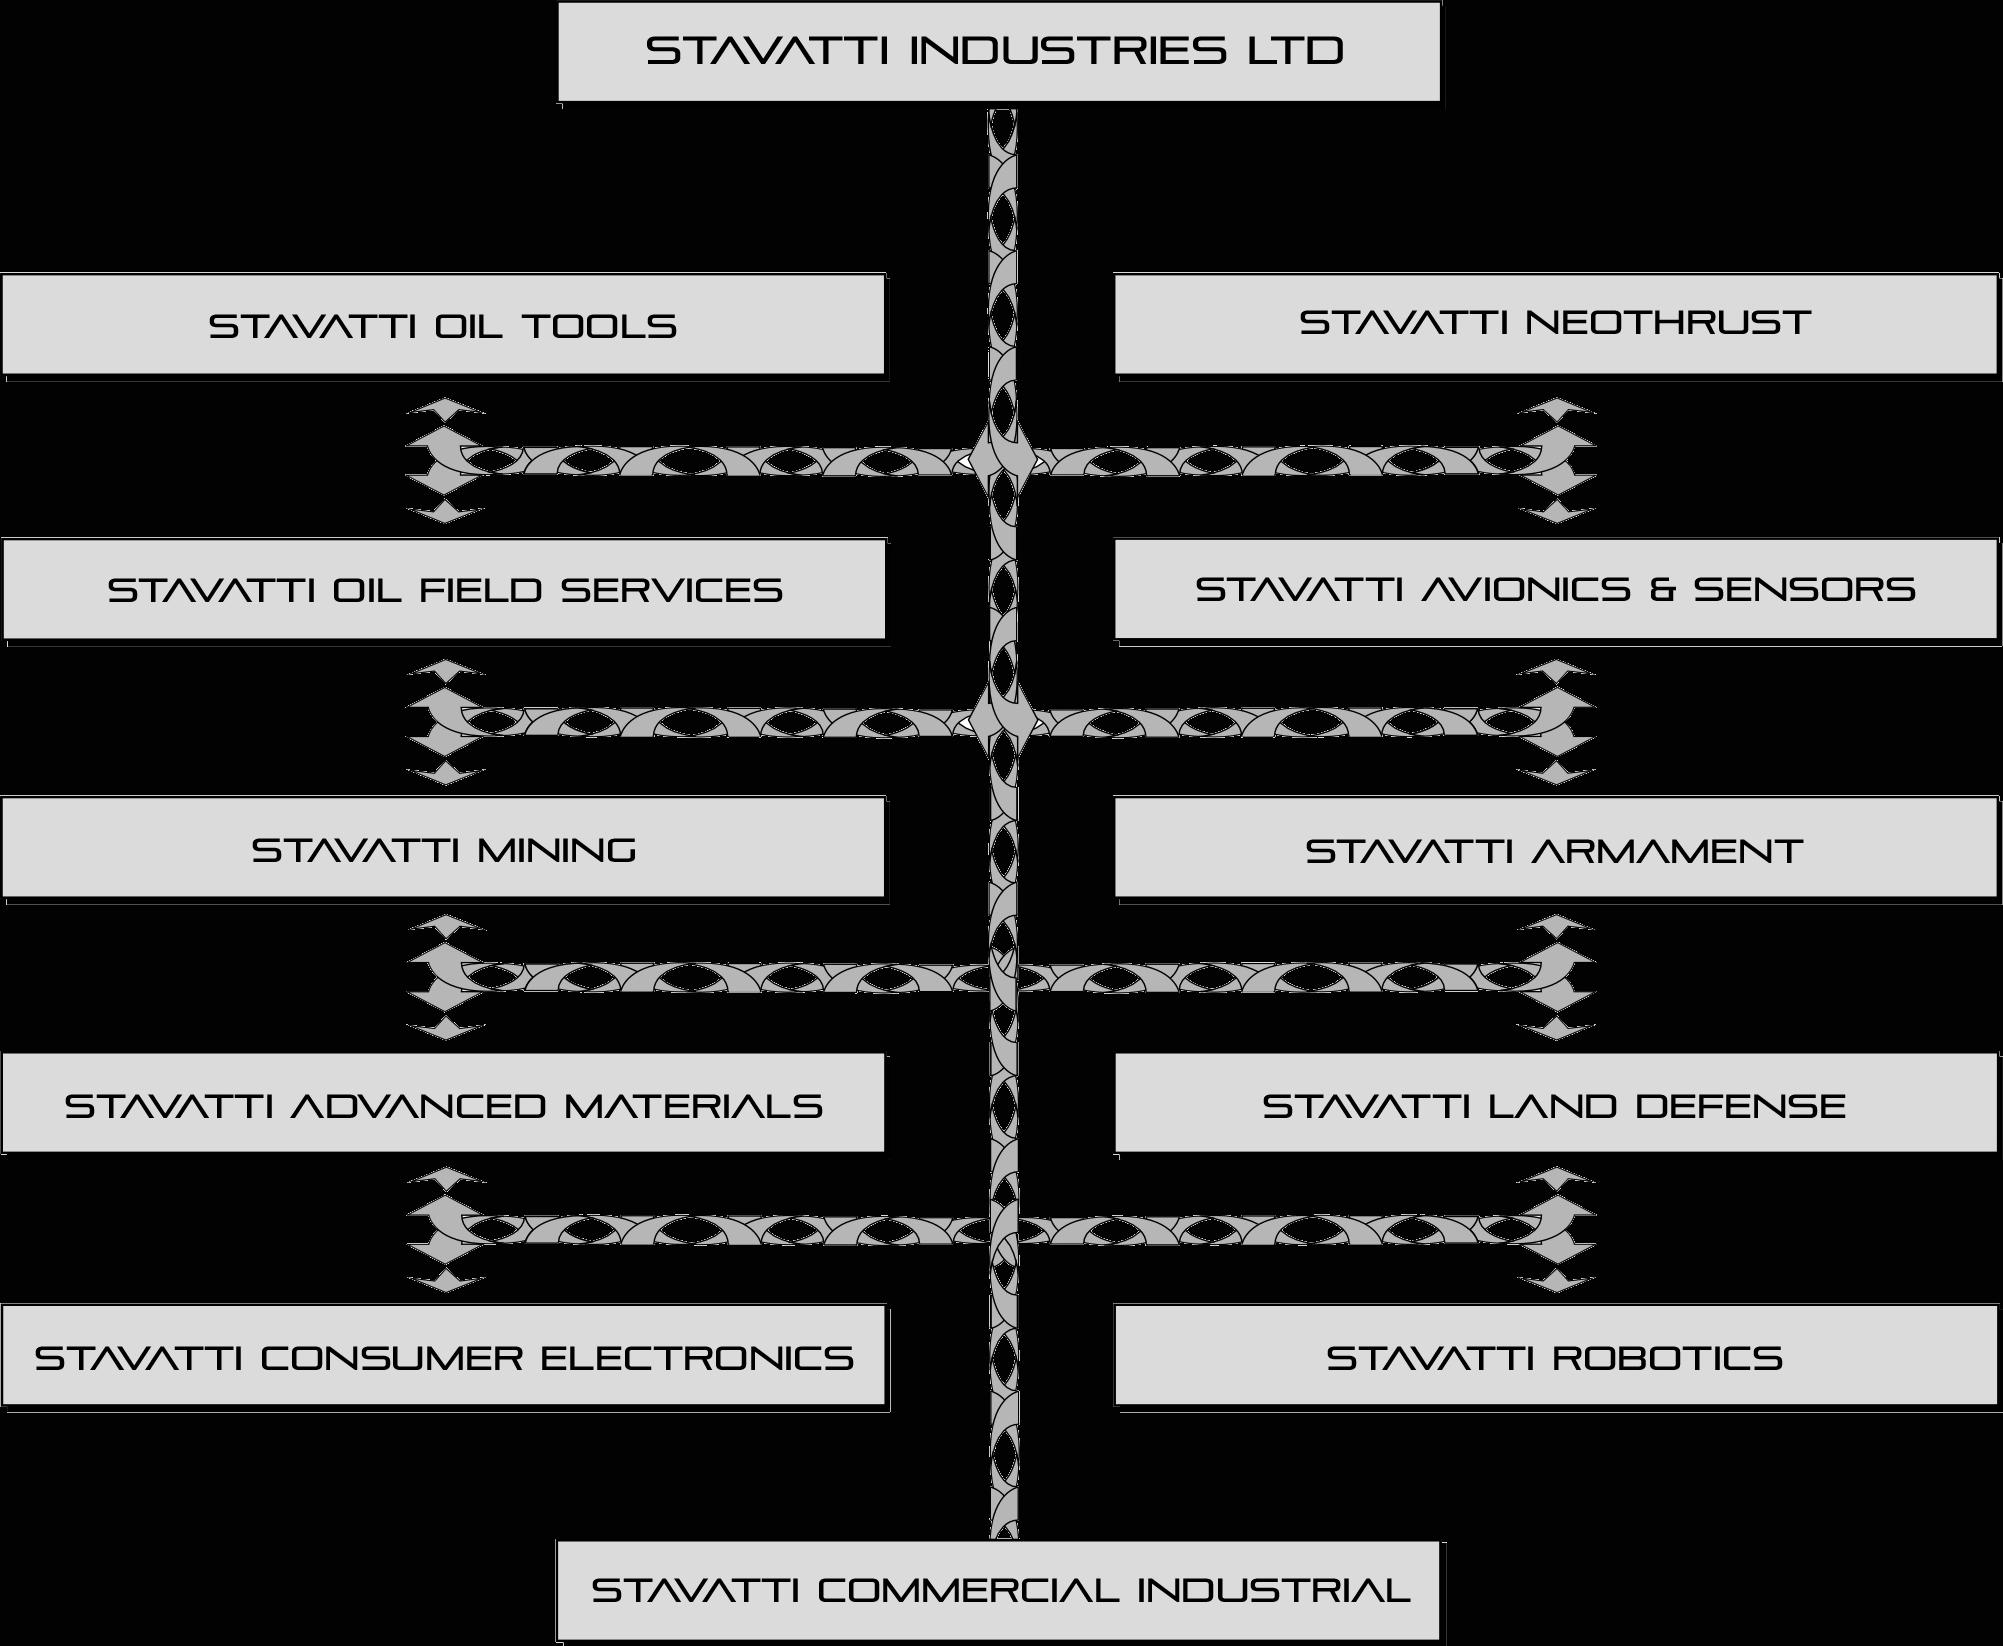 stavatti-industries